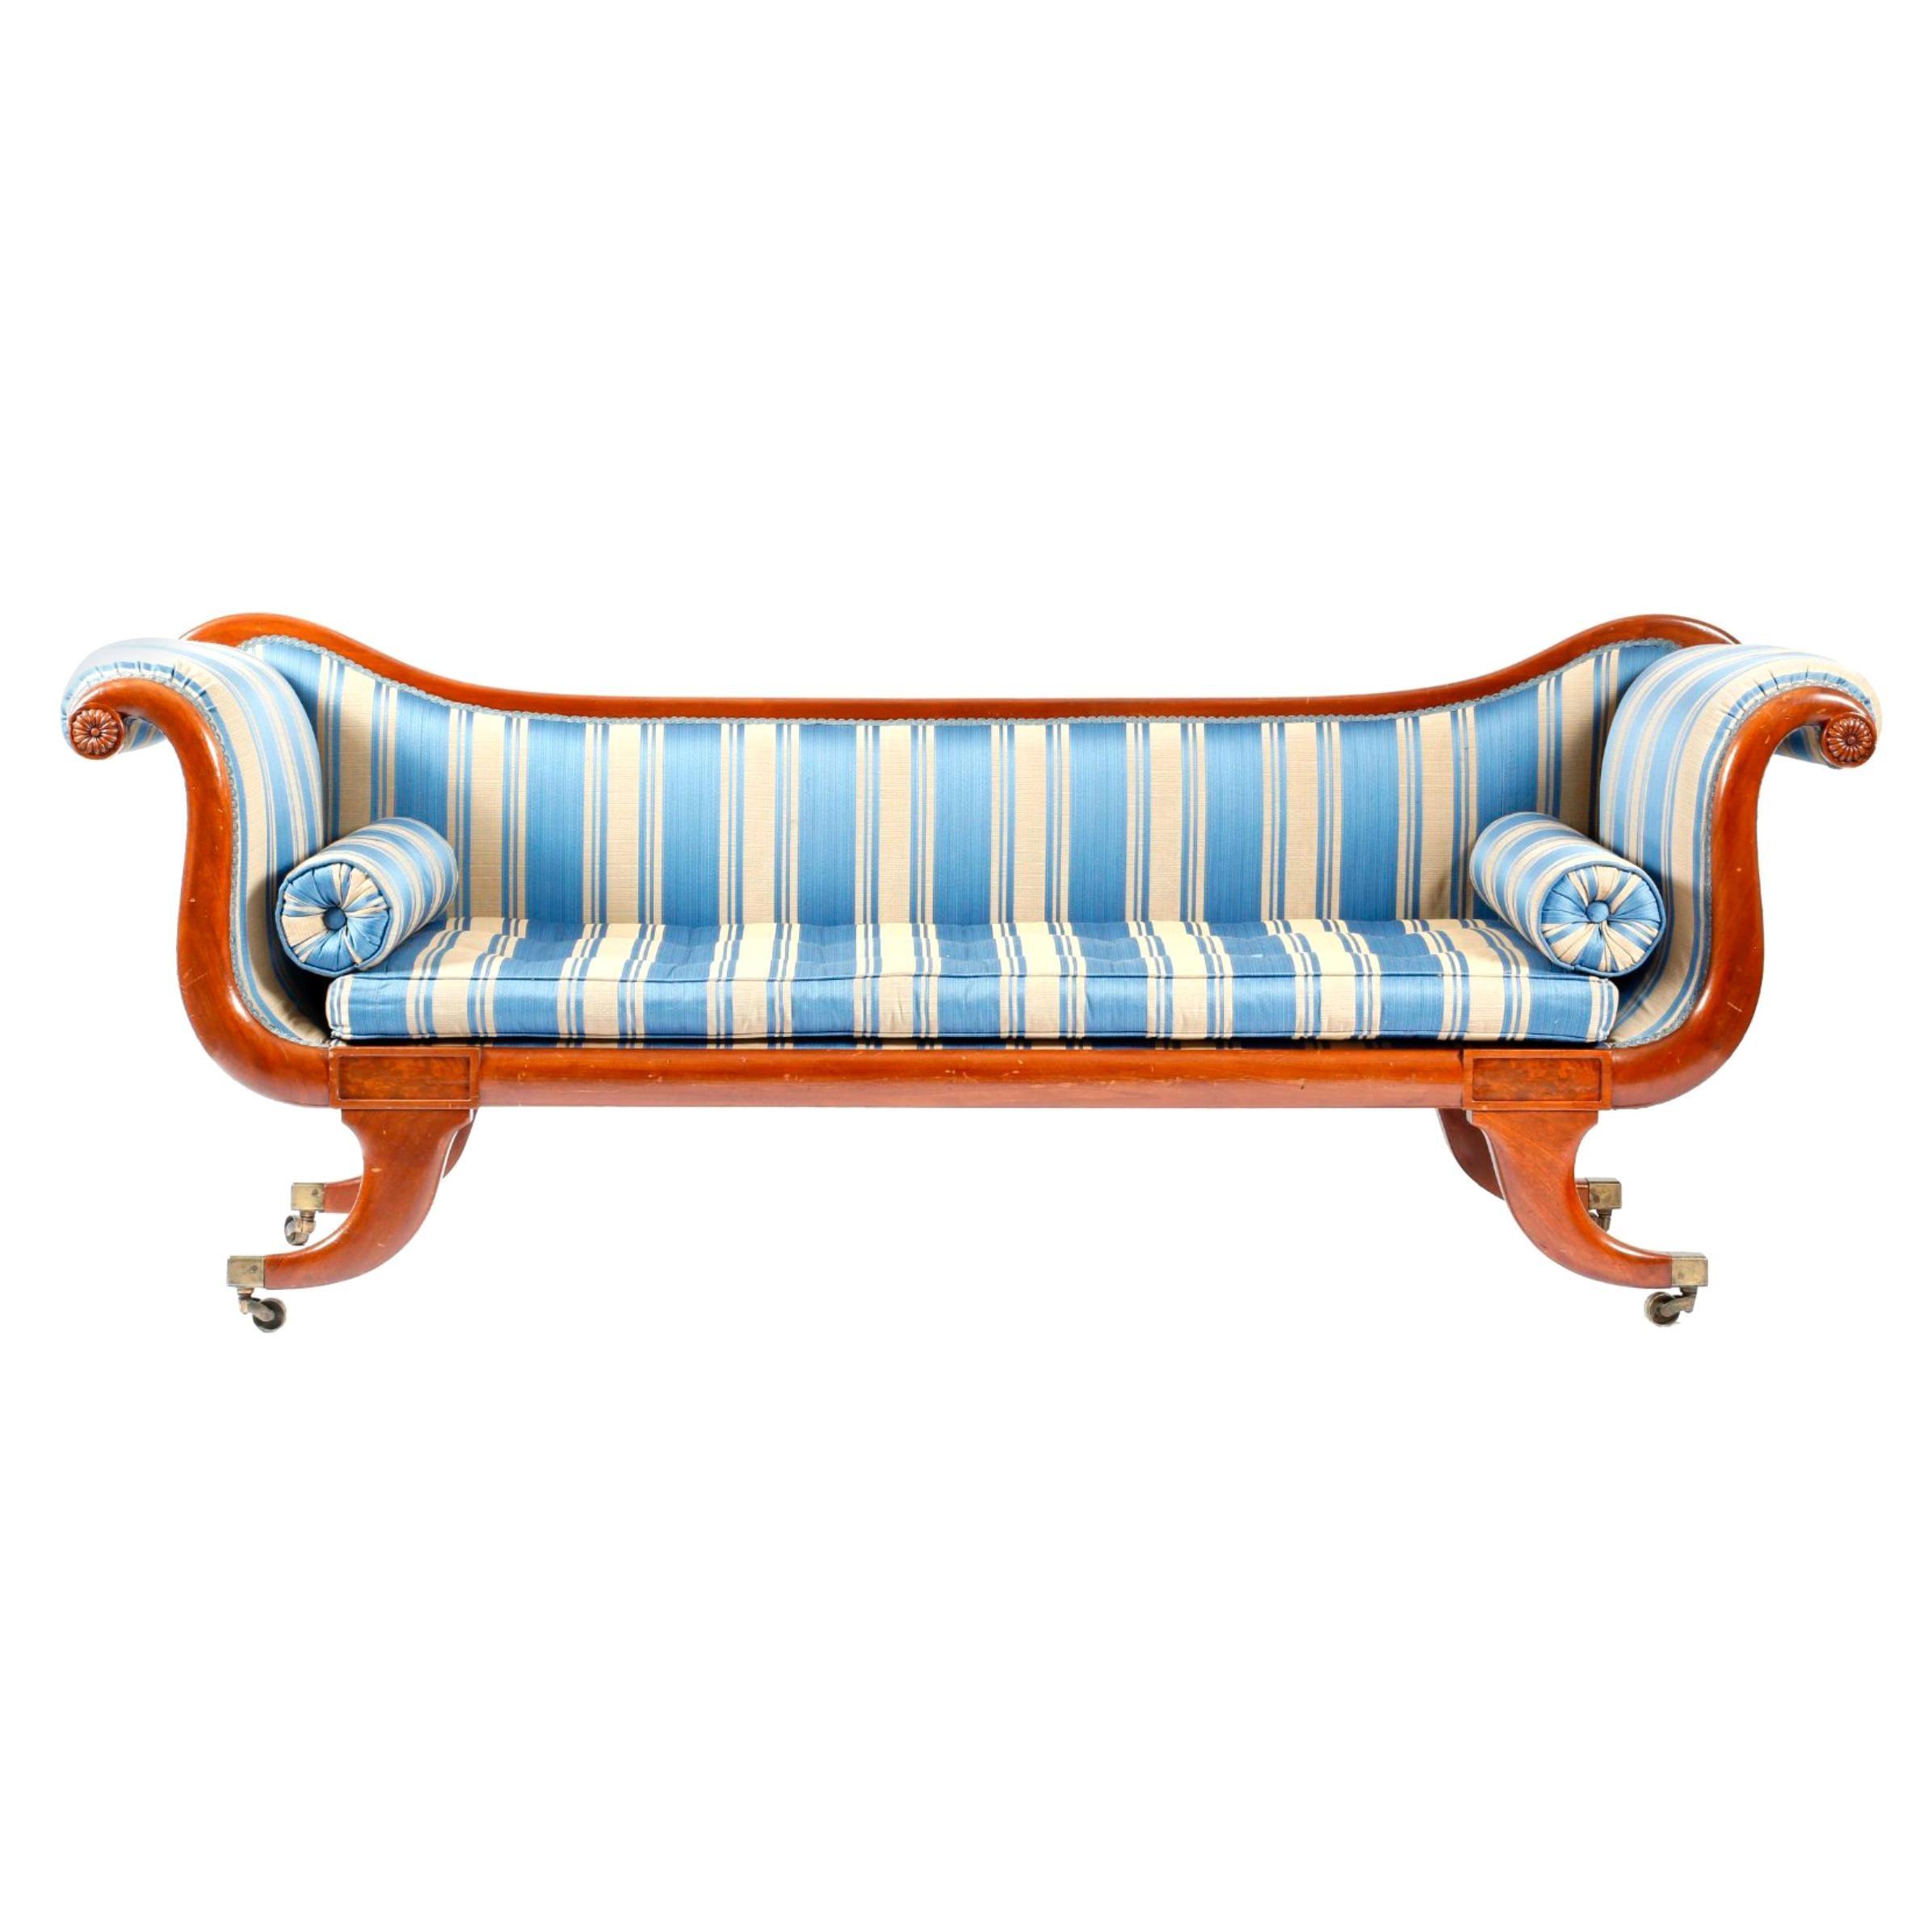 Late Regency Mahogany Scroll End Sofa In Blue Striped Fabric, England